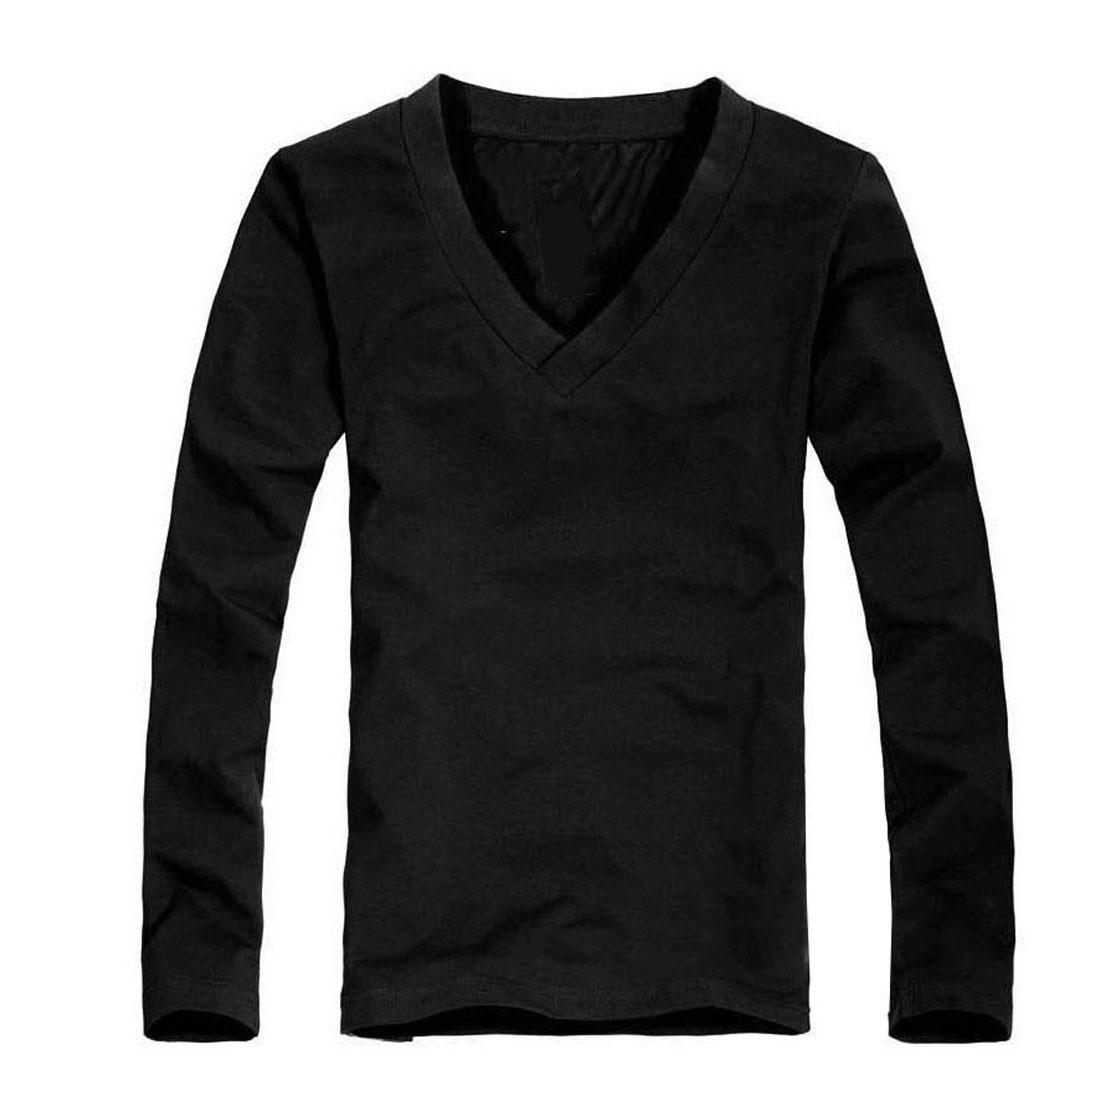 Mens Black V Neckline Long Sleeves Pullover Stretchy Shirt S